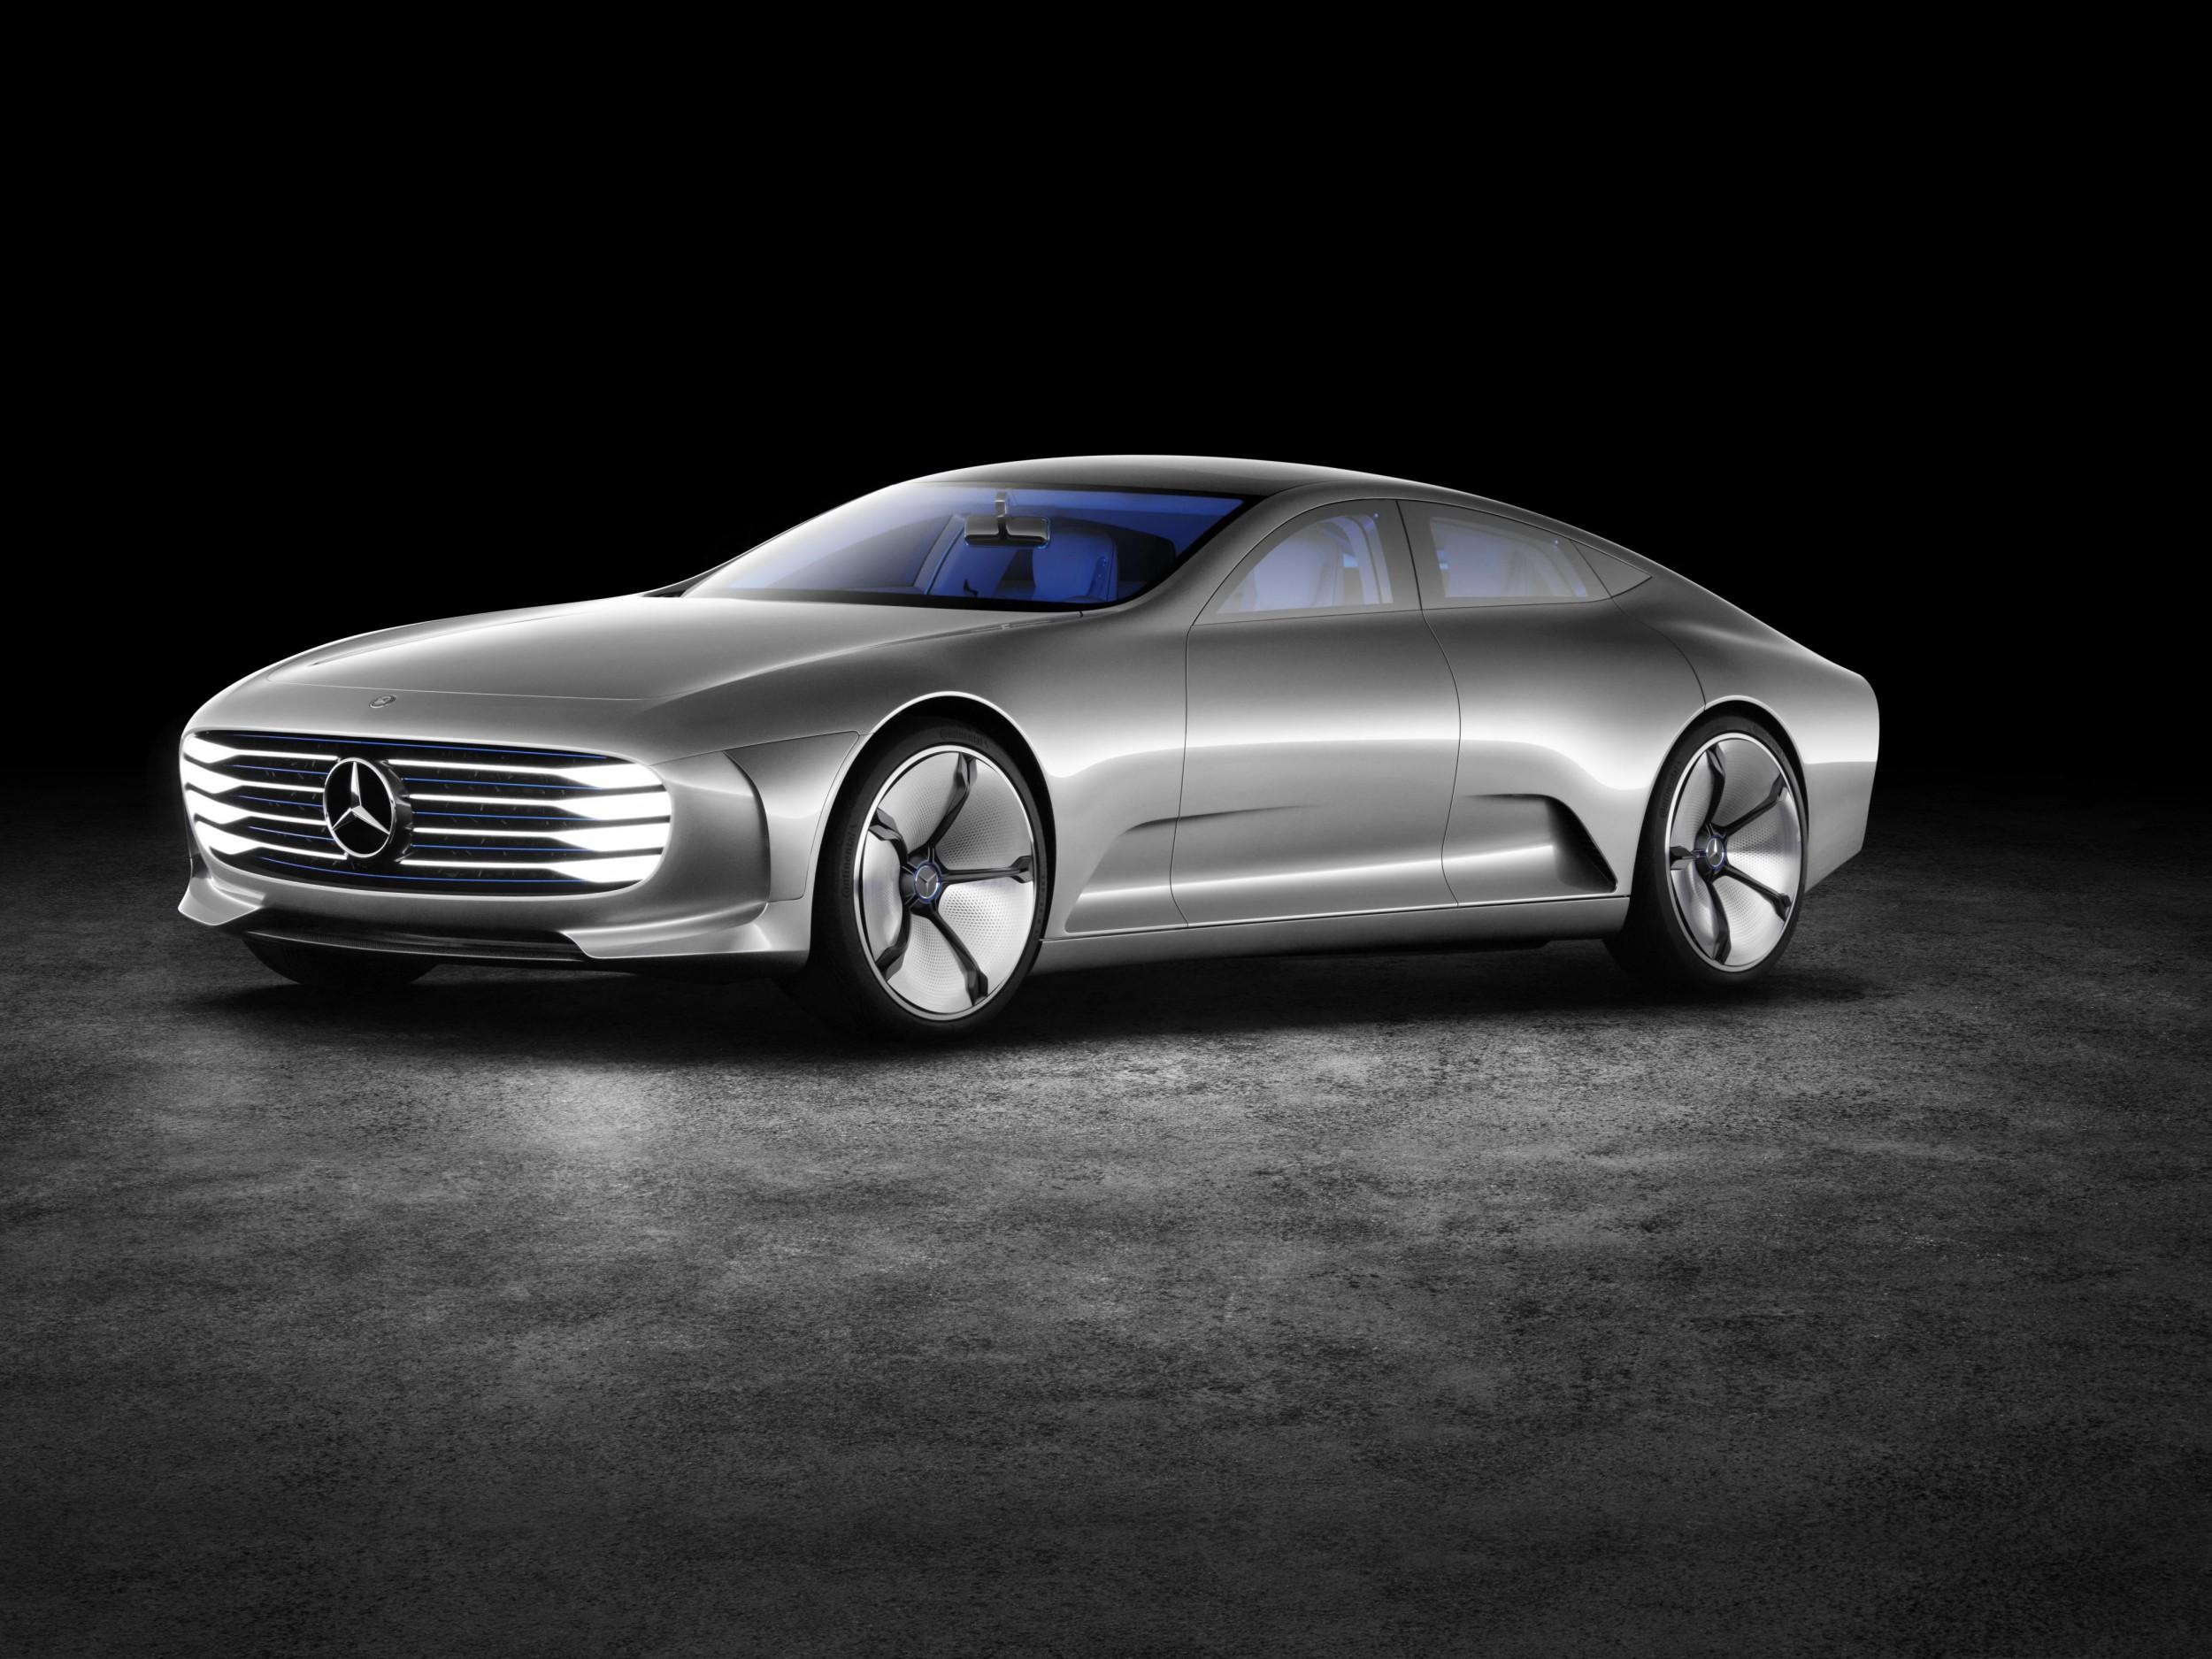 https://www.autotalk.com/wp-content/uploads/2015/09/2015-Mercedes-Benz-Concept-IAA-1.jpg